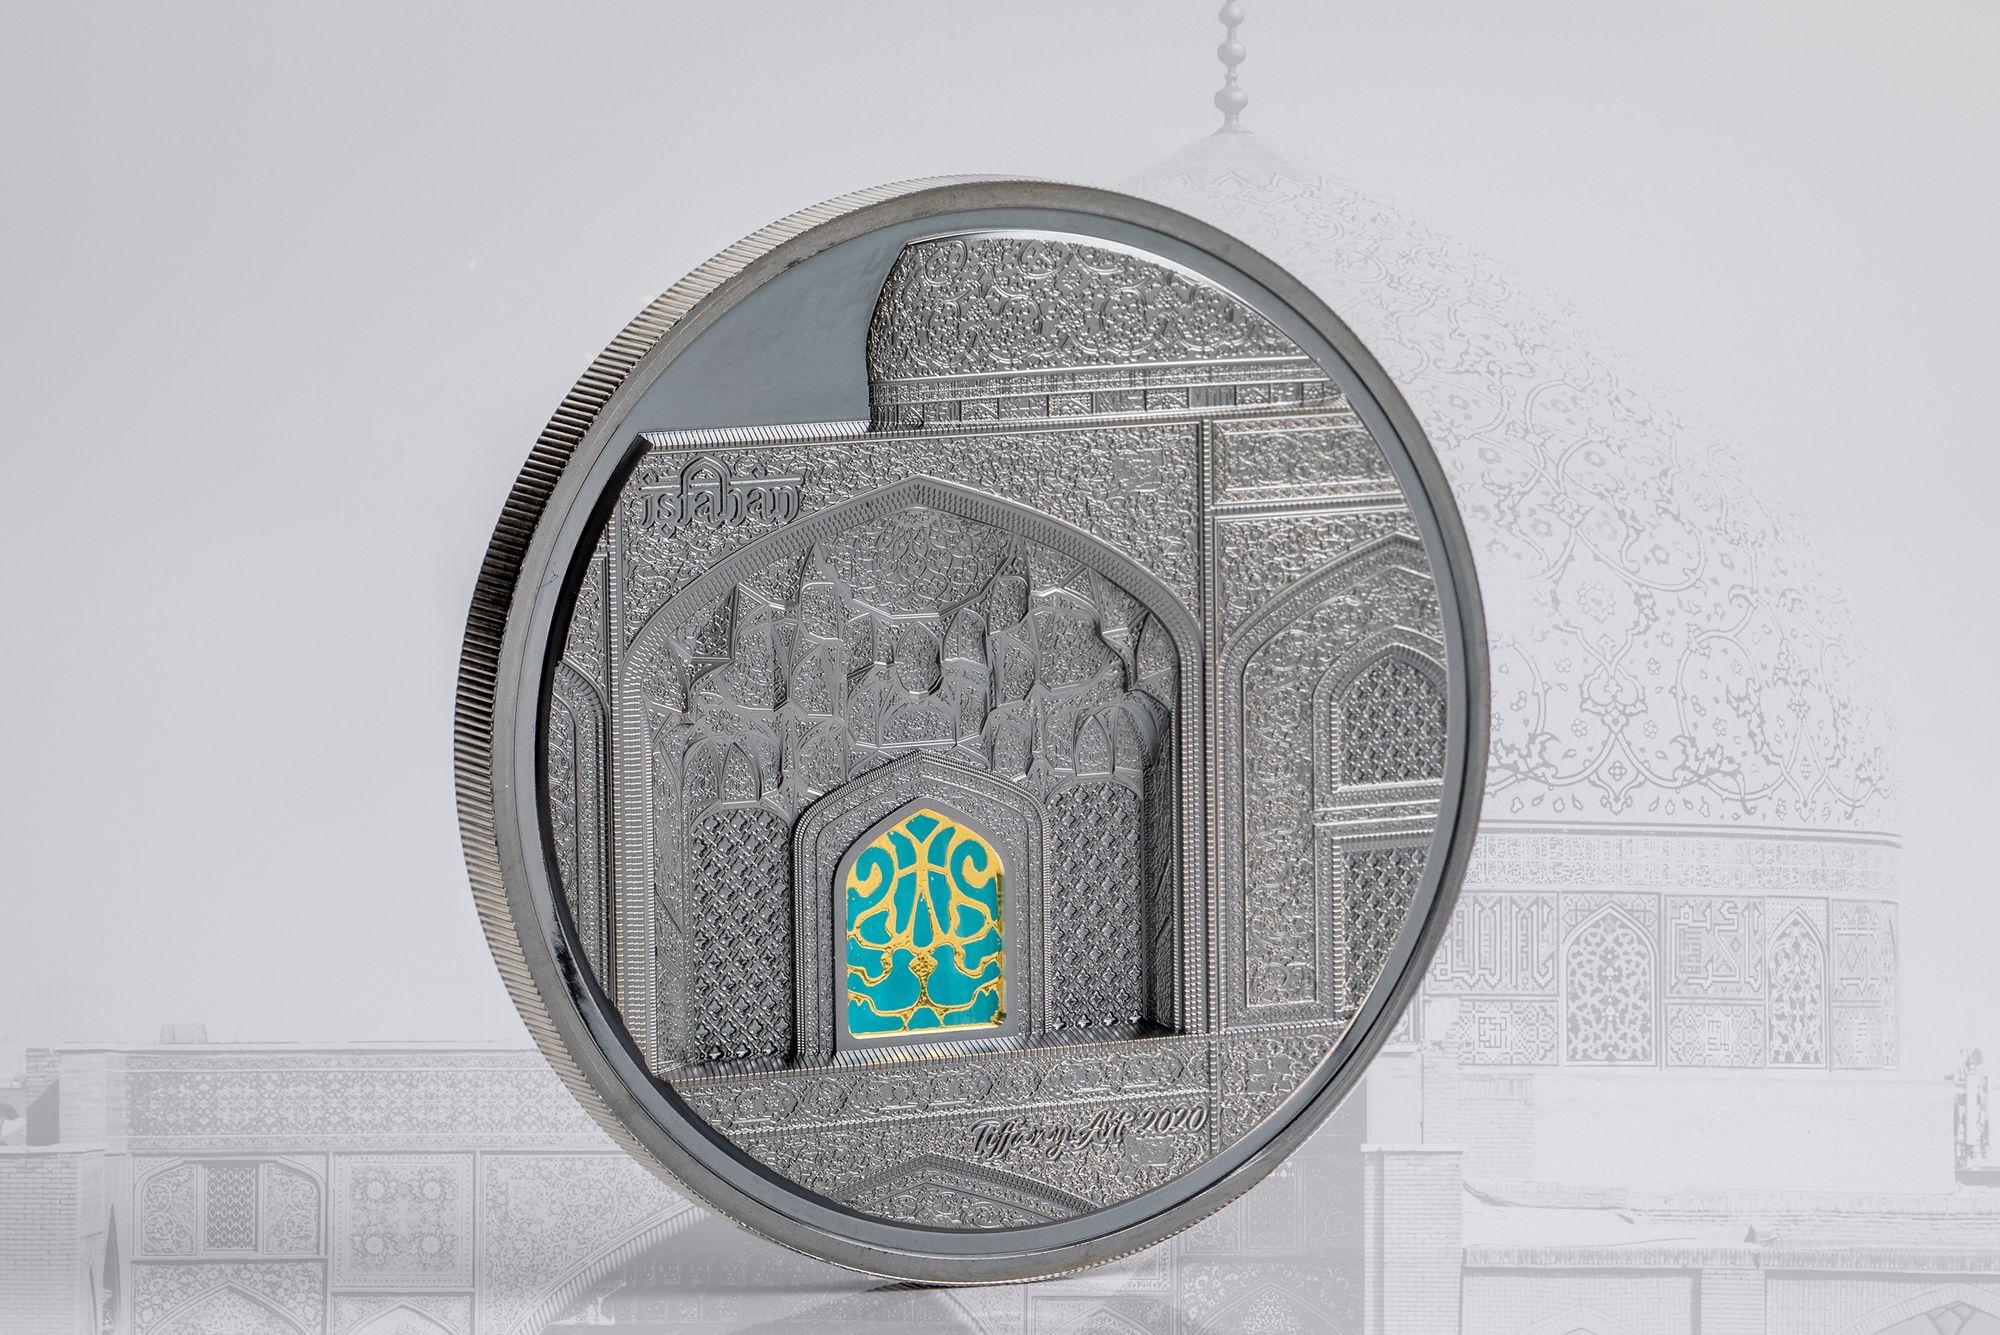 2020 Tiffany Art Isfahan 5oz Silver Black Proof Coin